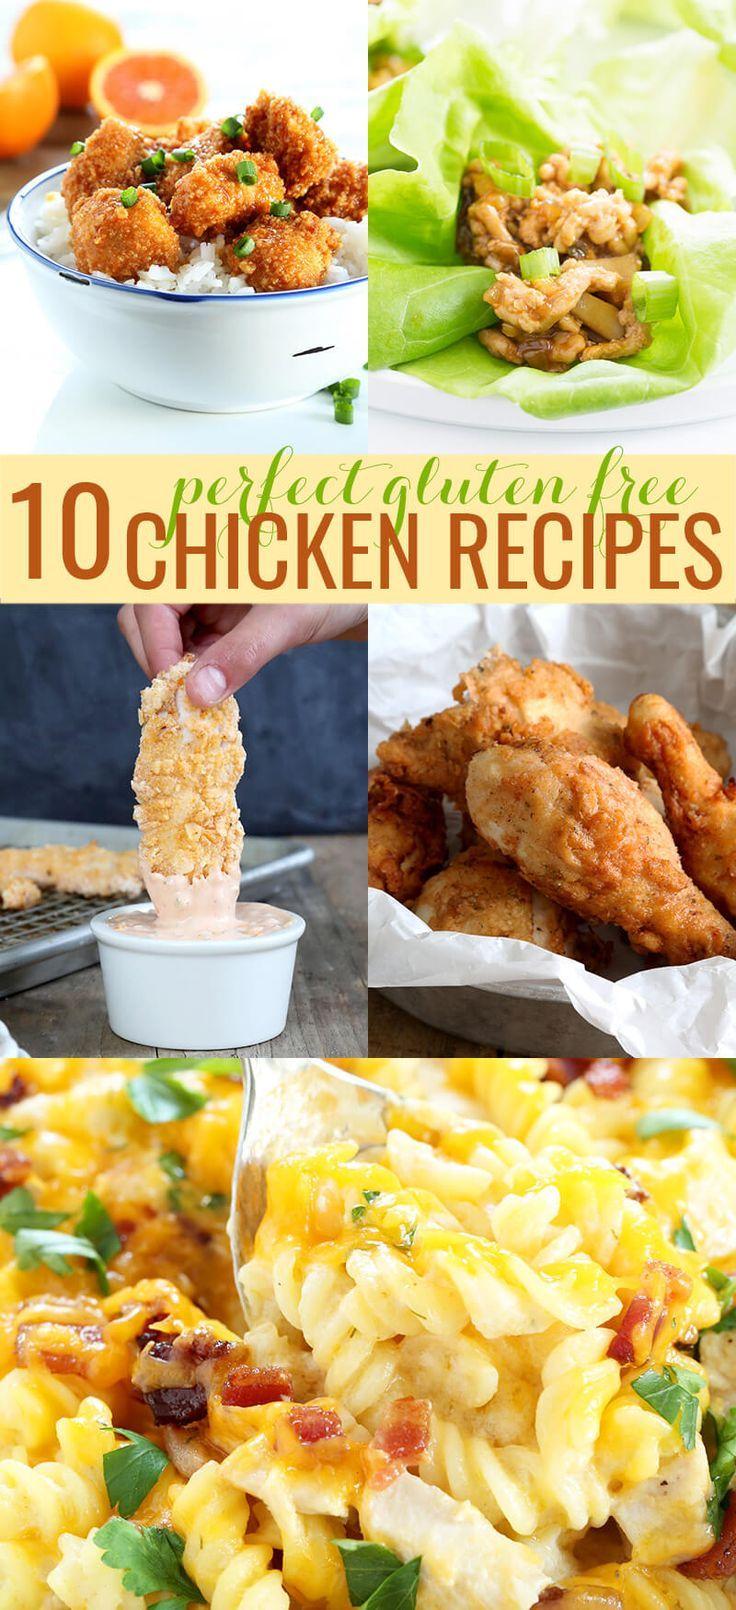 Ten easy gluten free chicken recipes: baked chicken casseroles, chicken fingers, take-out style orange chicken and fried chicken that tastes just like KFC!